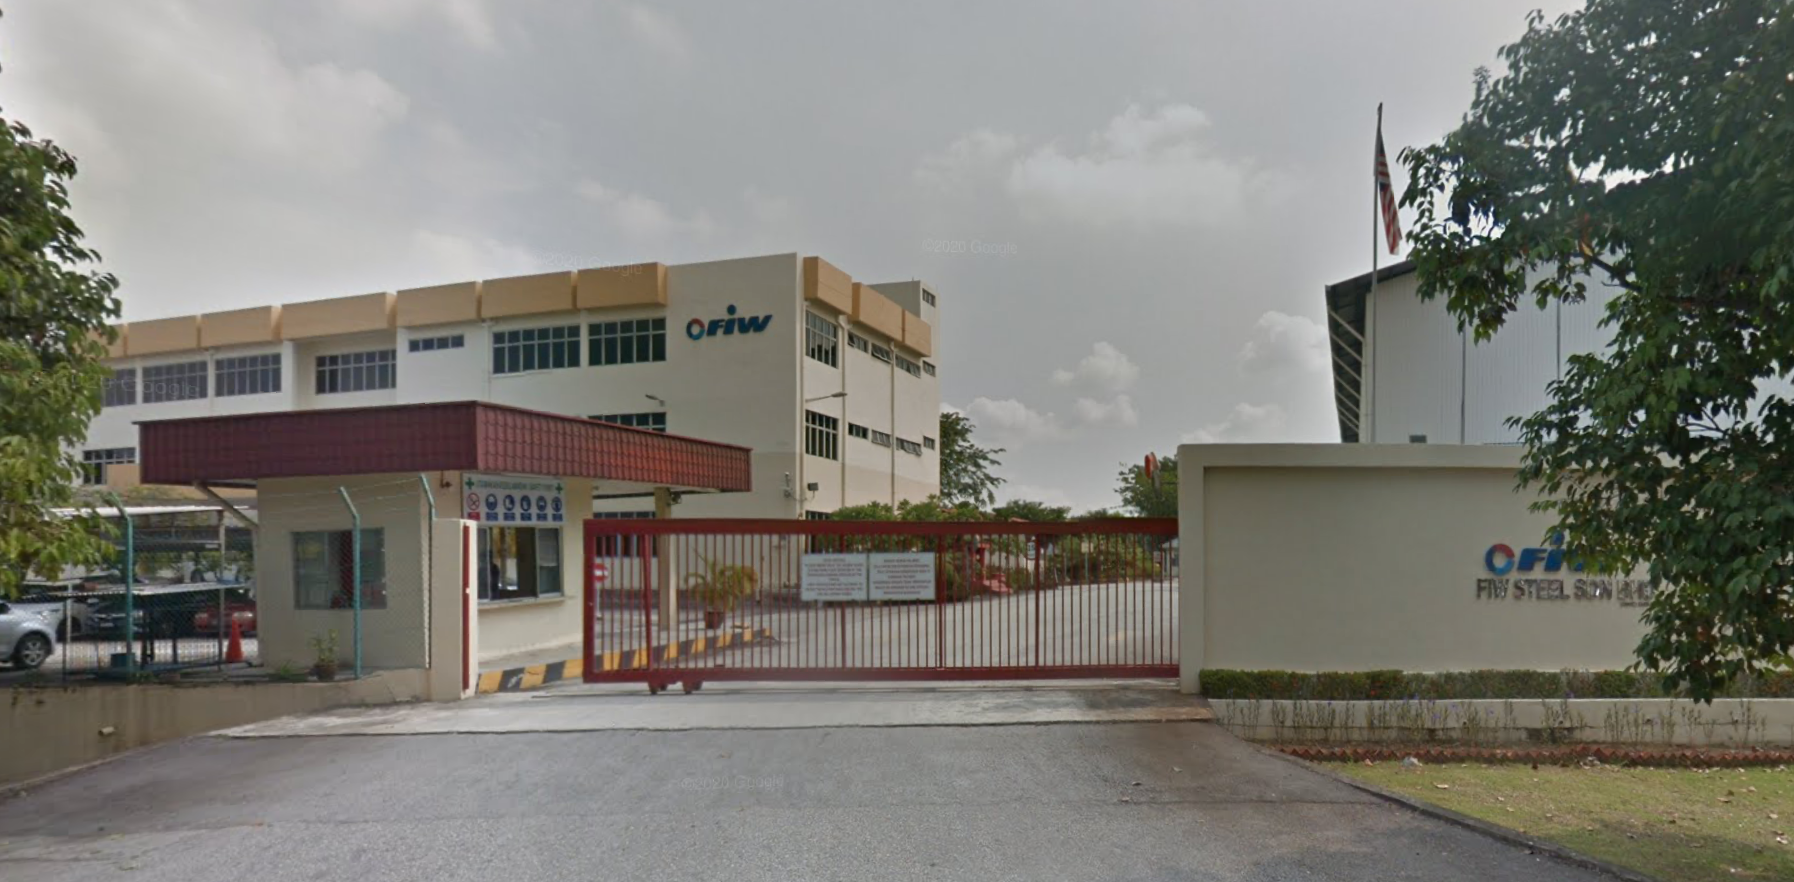 Axis REIT property in Selangor (Photo: Google Maps)